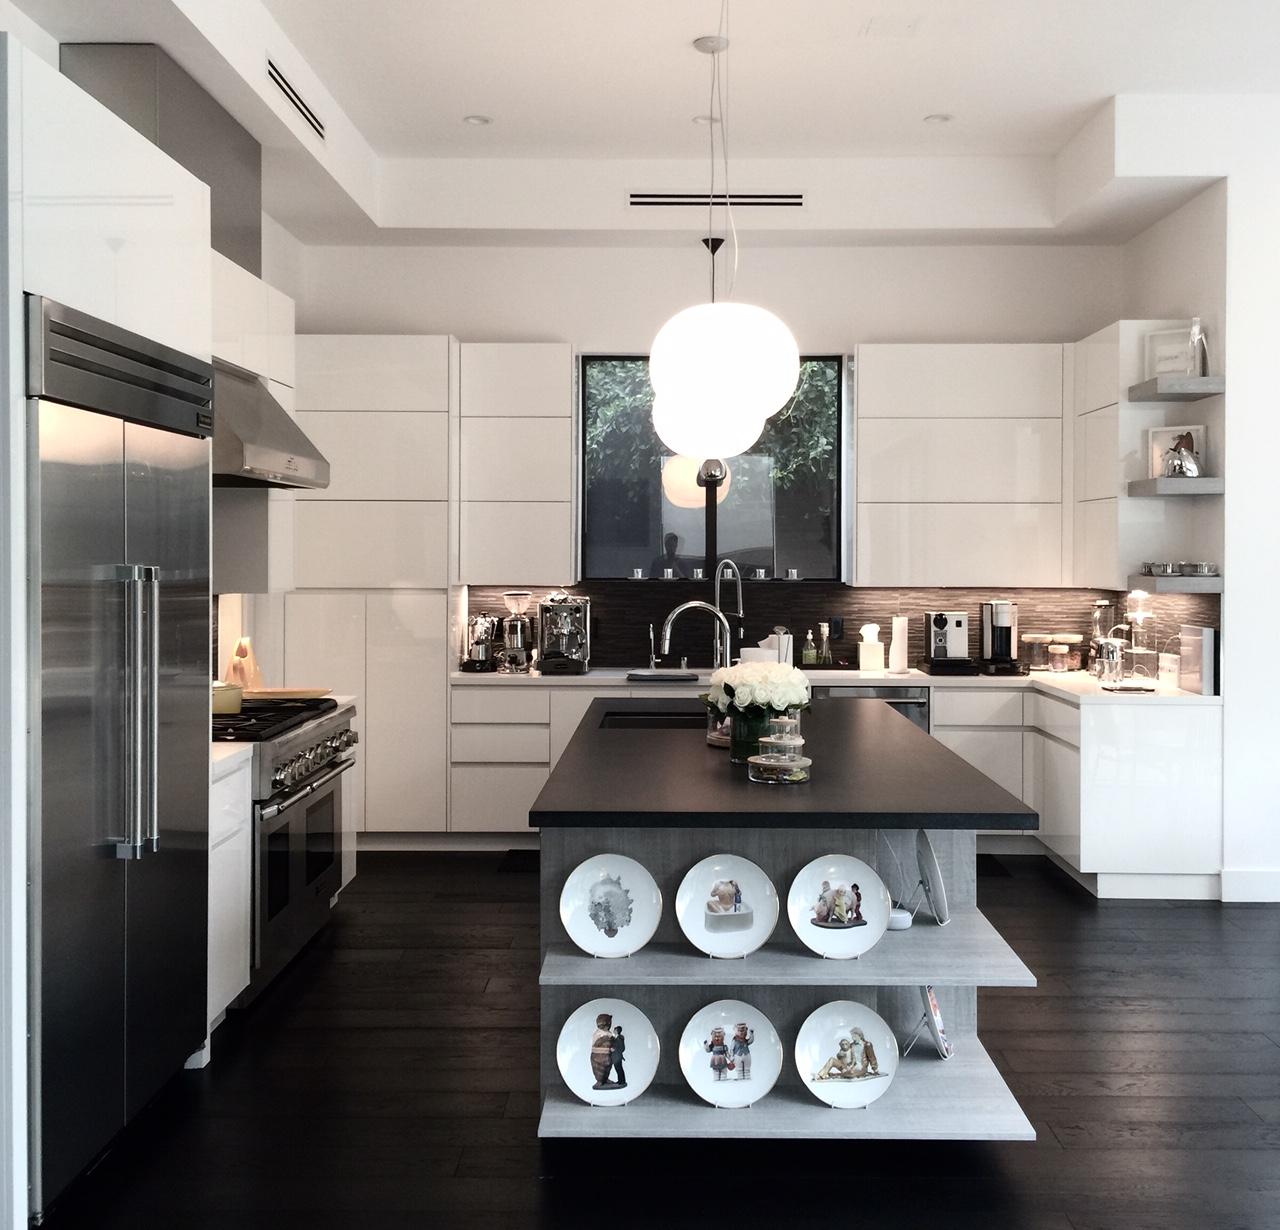 Jeff Koons plates in the kitchen. Courtesy of Melissa de la Cruz and Michael Johnston.